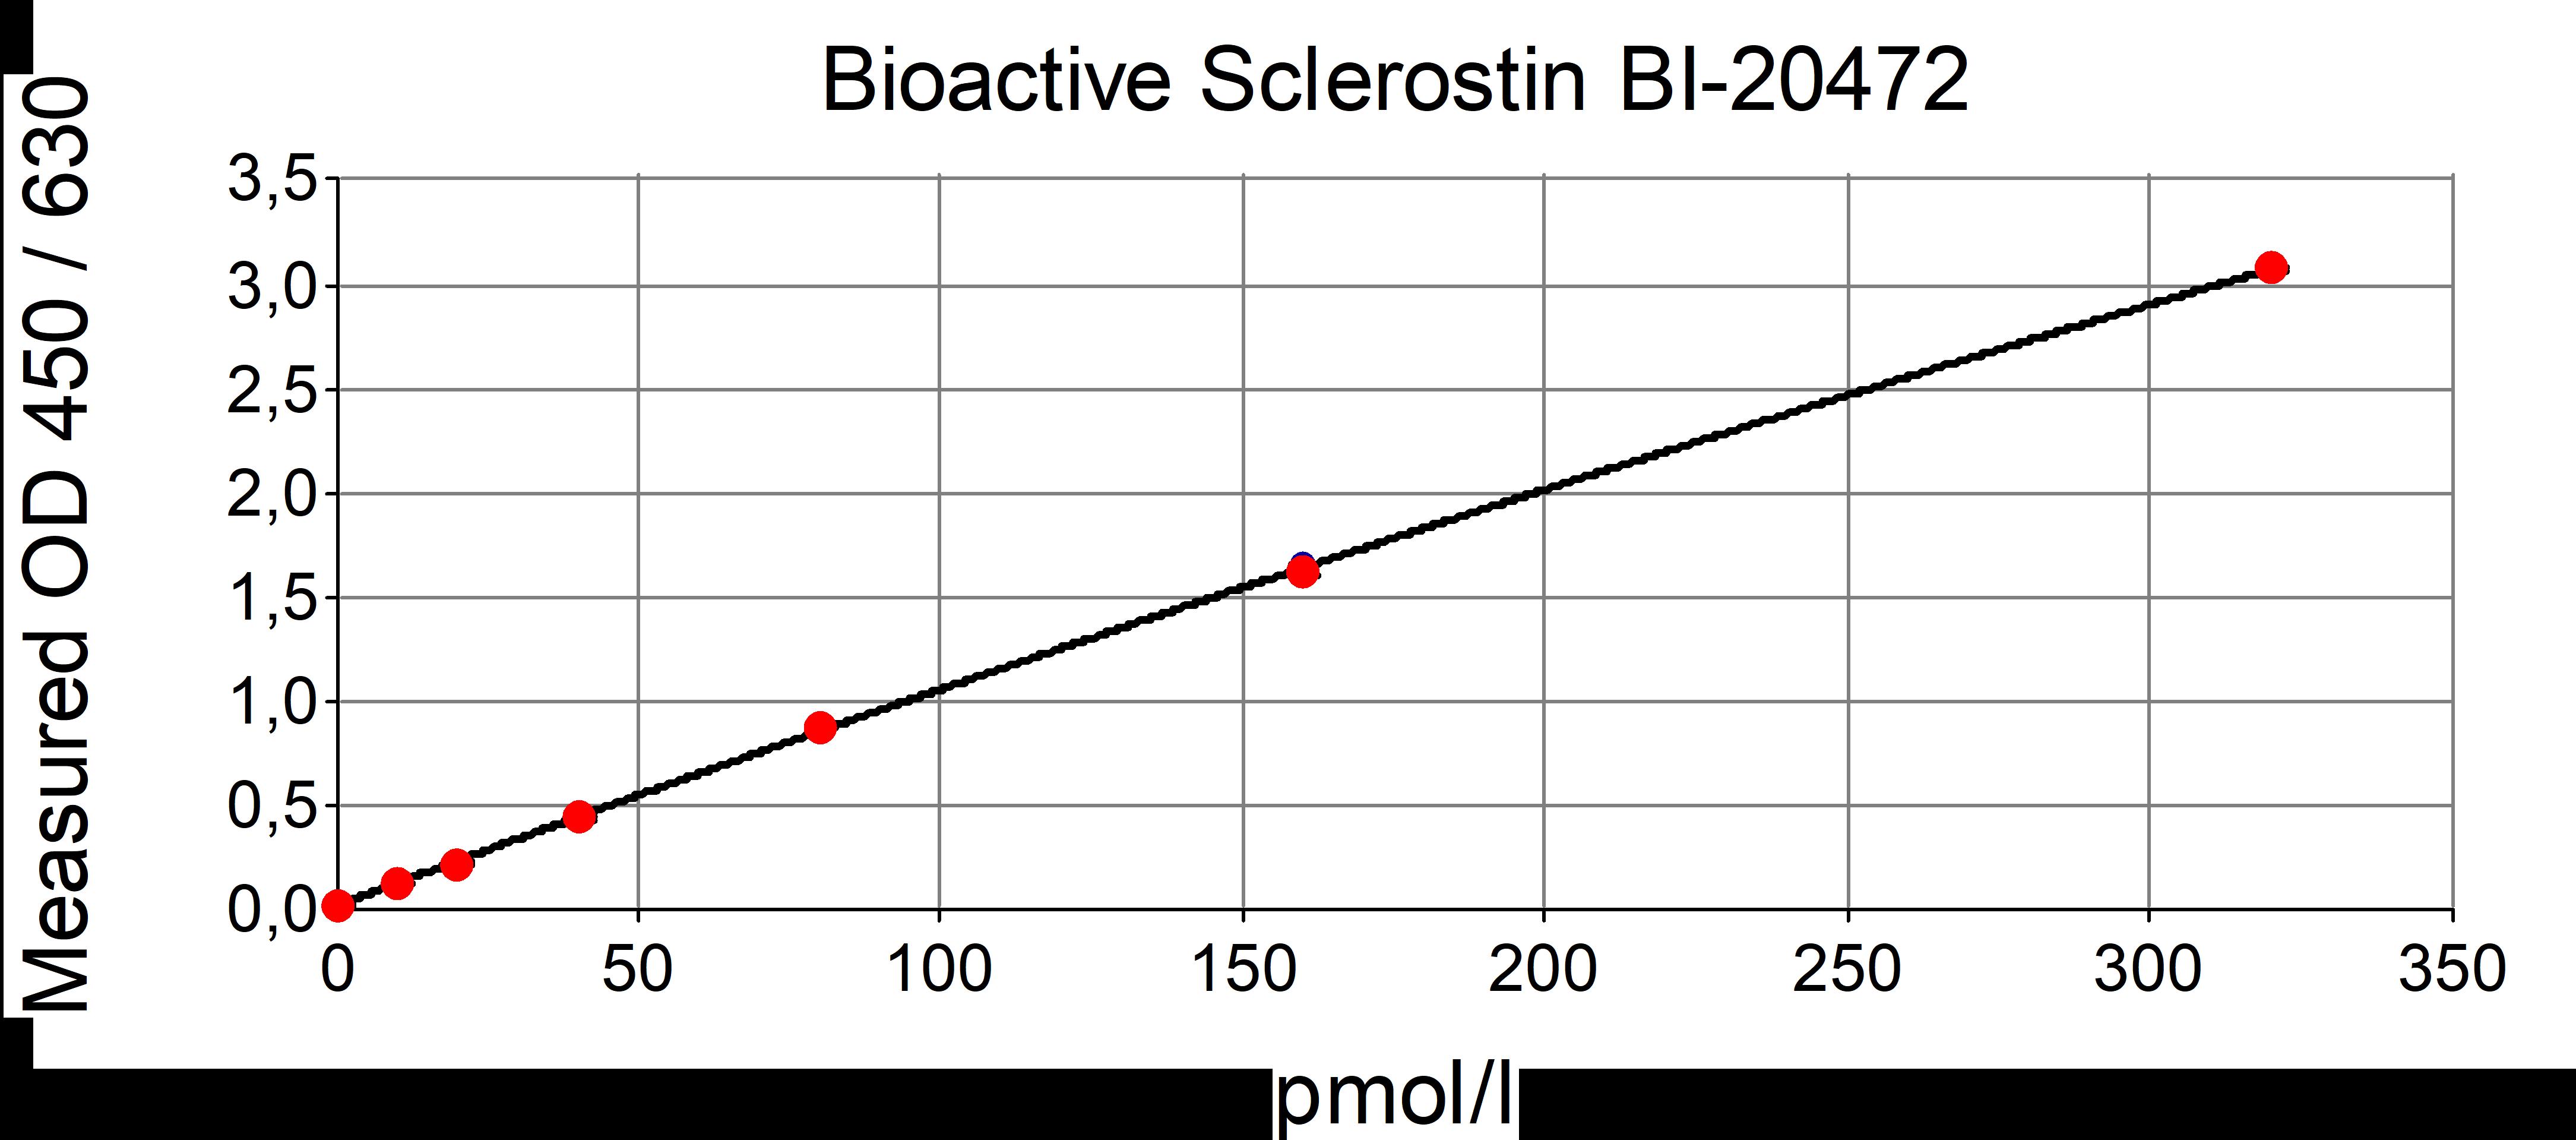 Bioactive Sclerostin ELISA